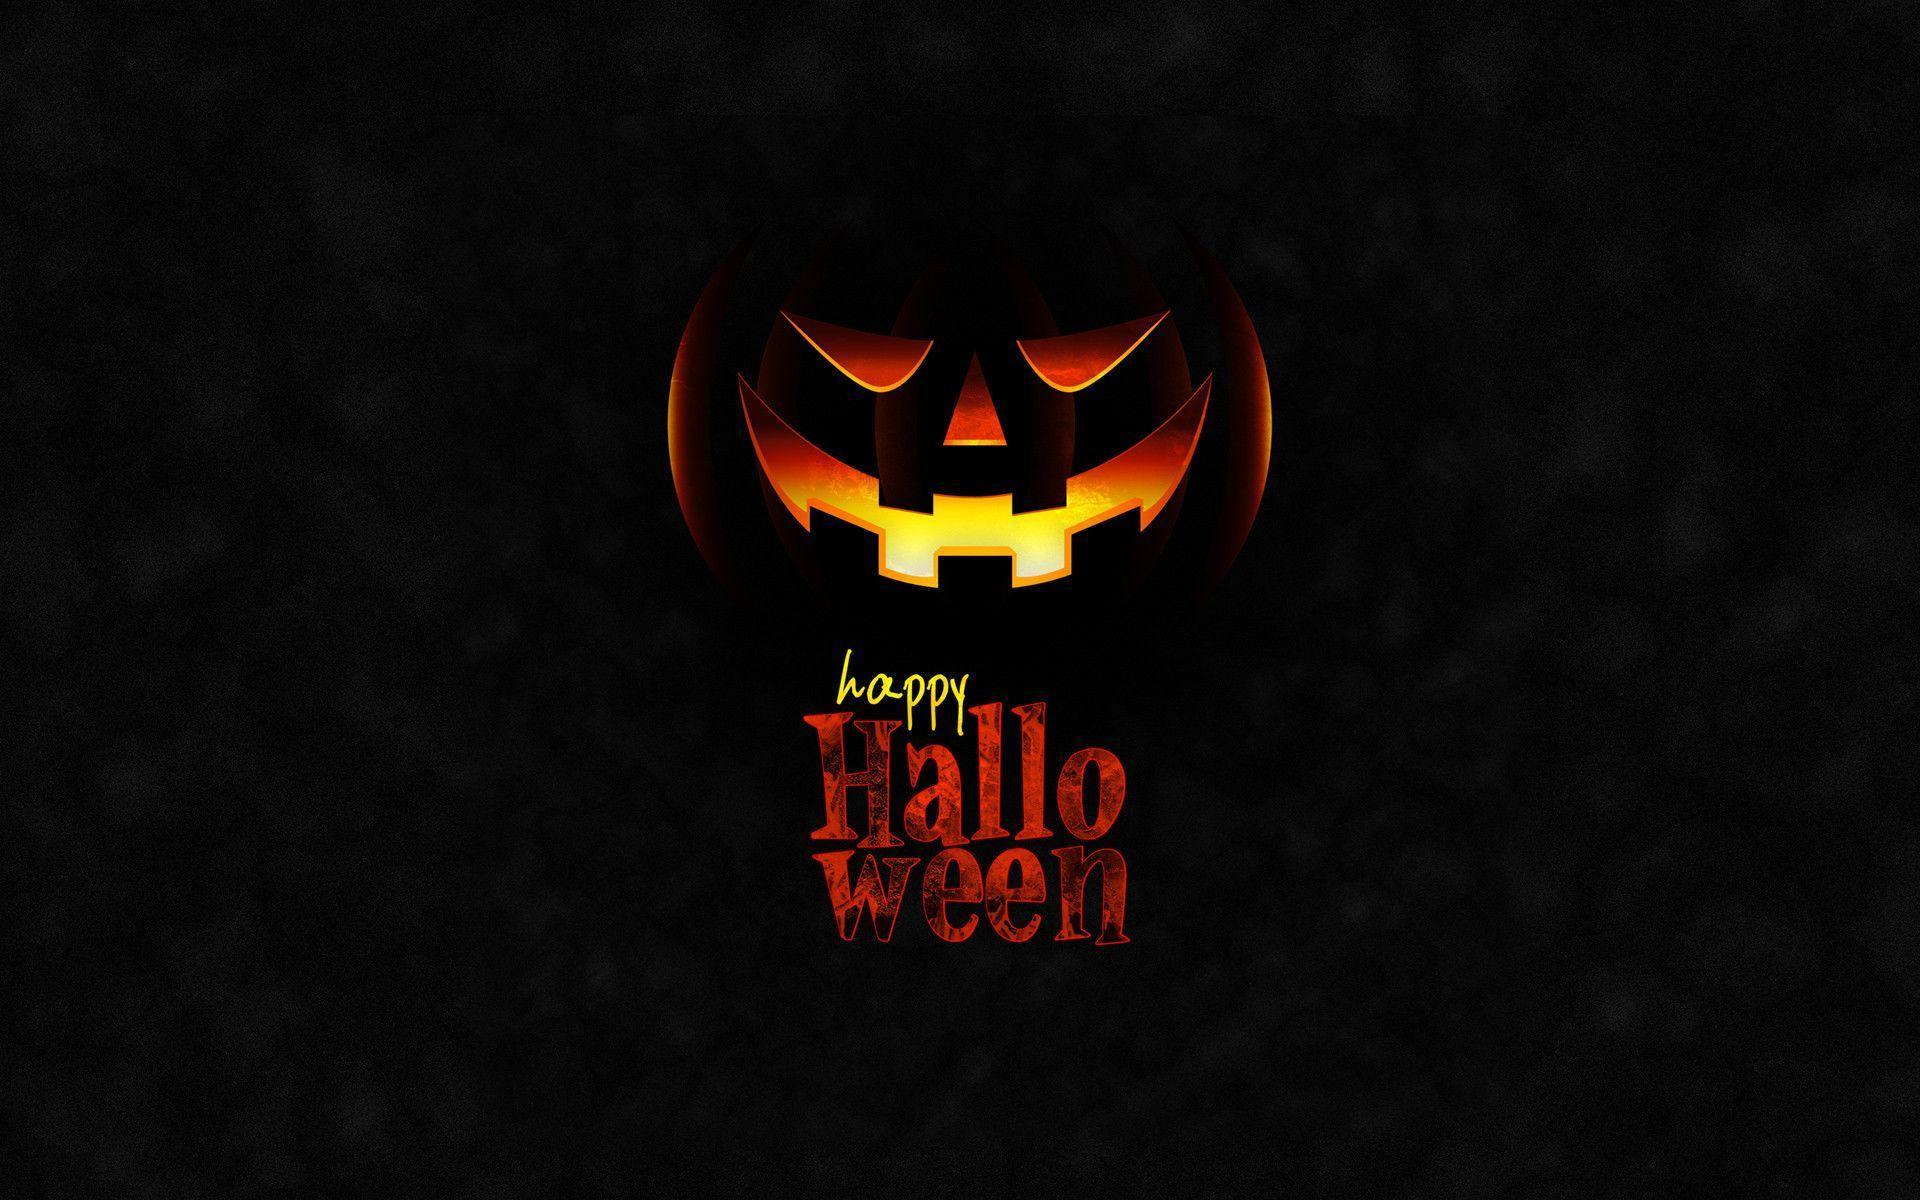 Happy Halloween Wallpapers - Full HD wallpaper search